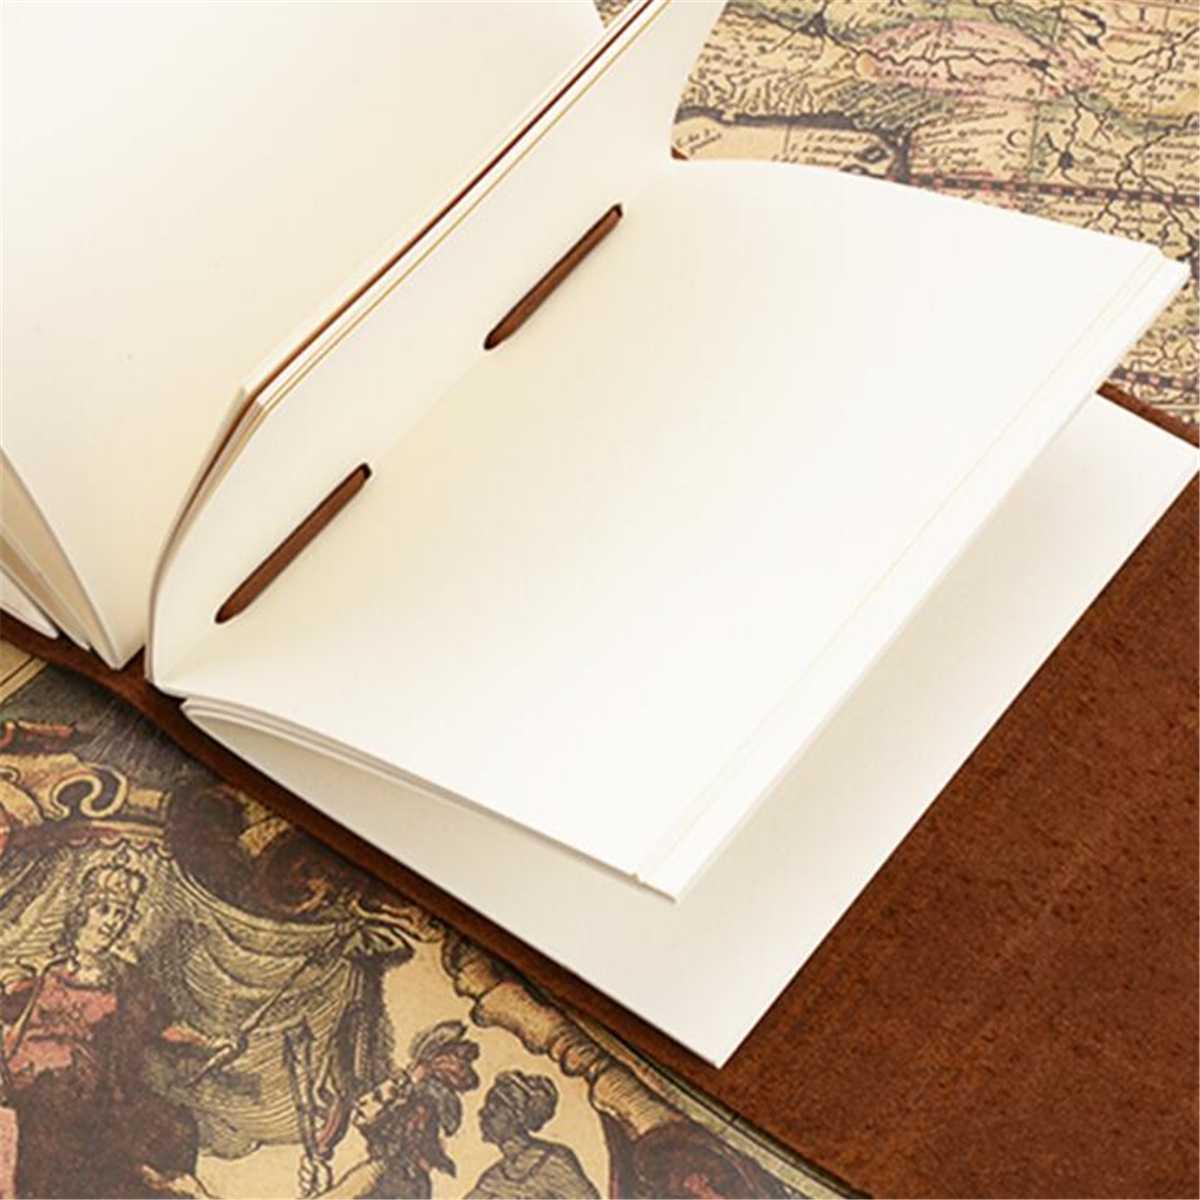 Genuine Leather Diary Write Notebook Retro Travel Journal Travel Handmade  Vintage Writing Paper Hard Cover Sketchbook School